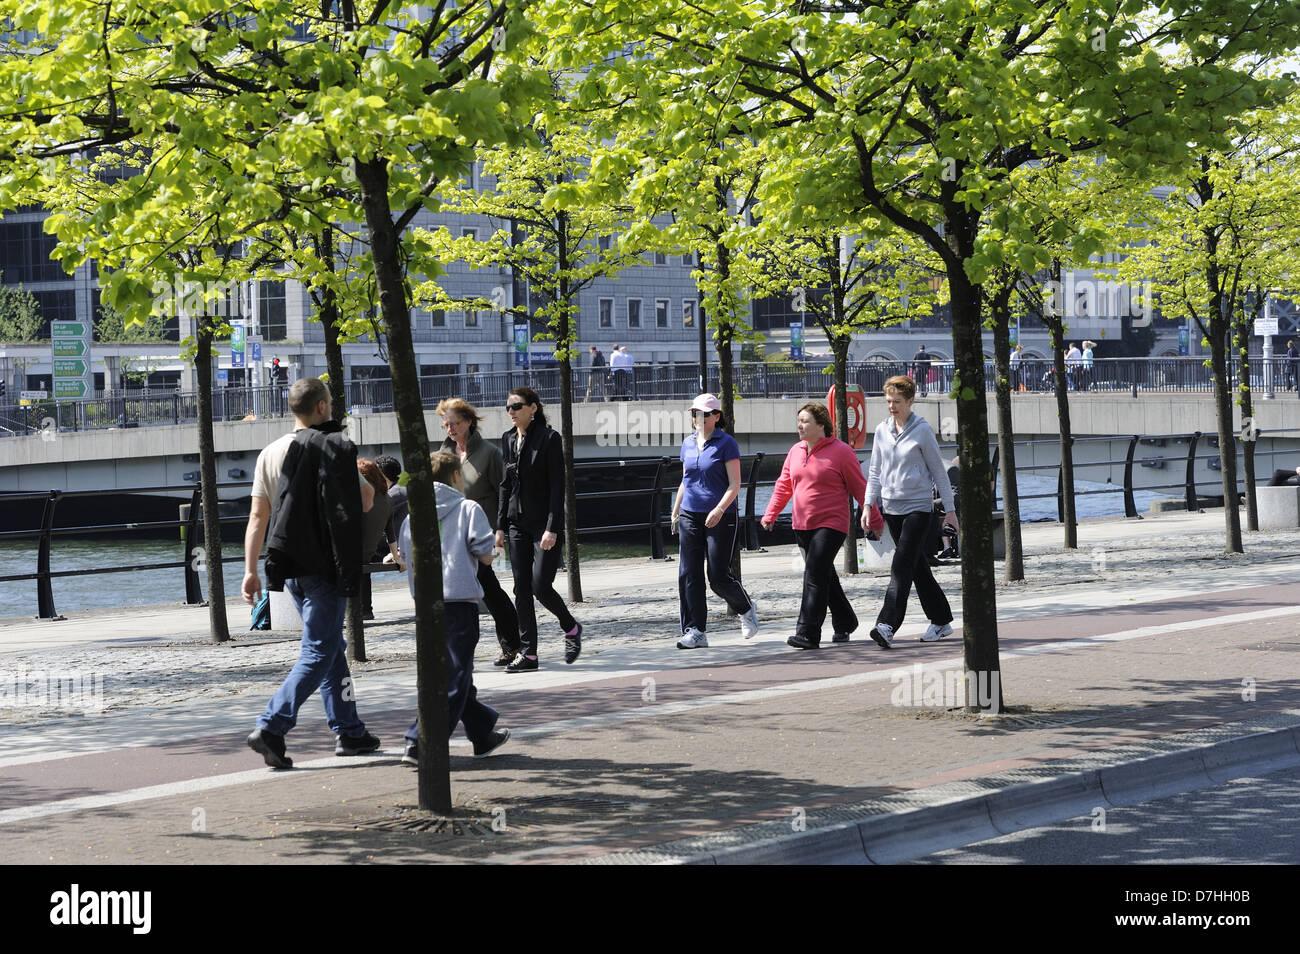 Dubin City Docklands - Stock Image